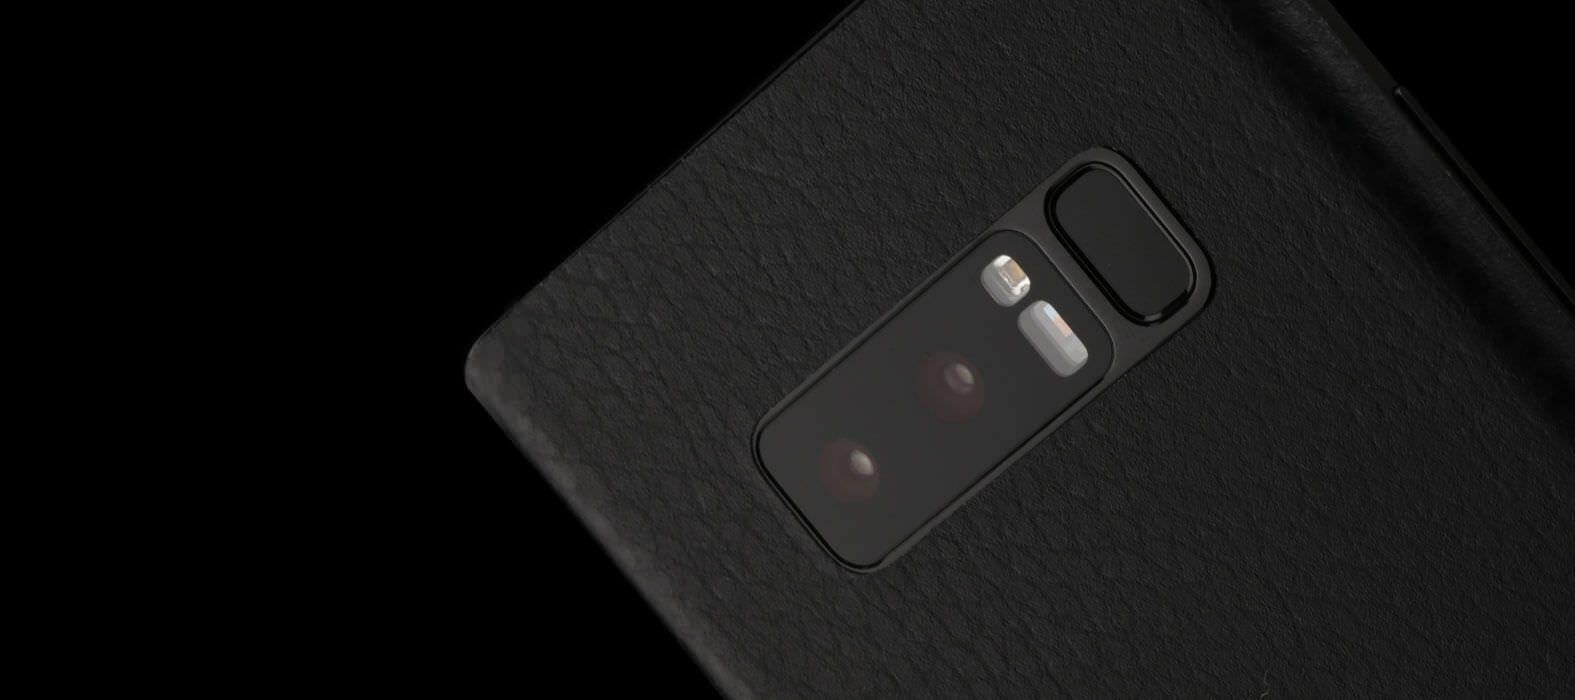 Galaxy Note8 Skins